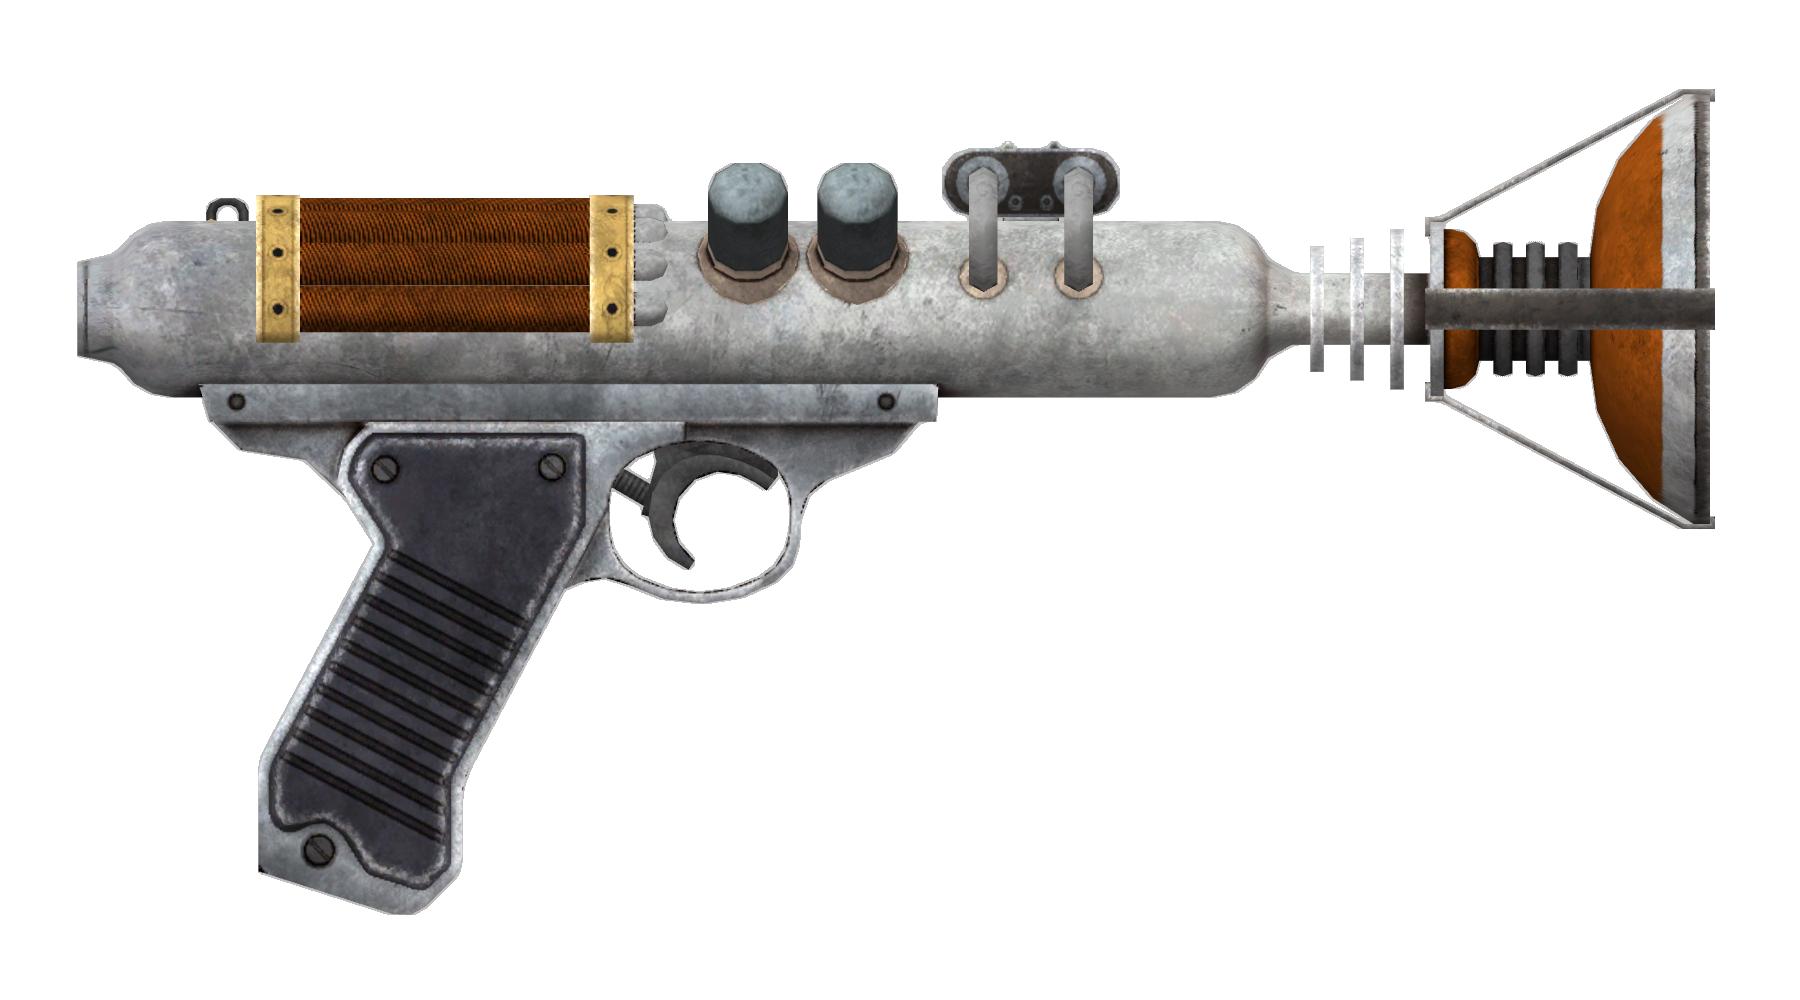 Png Laser Gun Transparent Laser Gun Png Images Pluspng